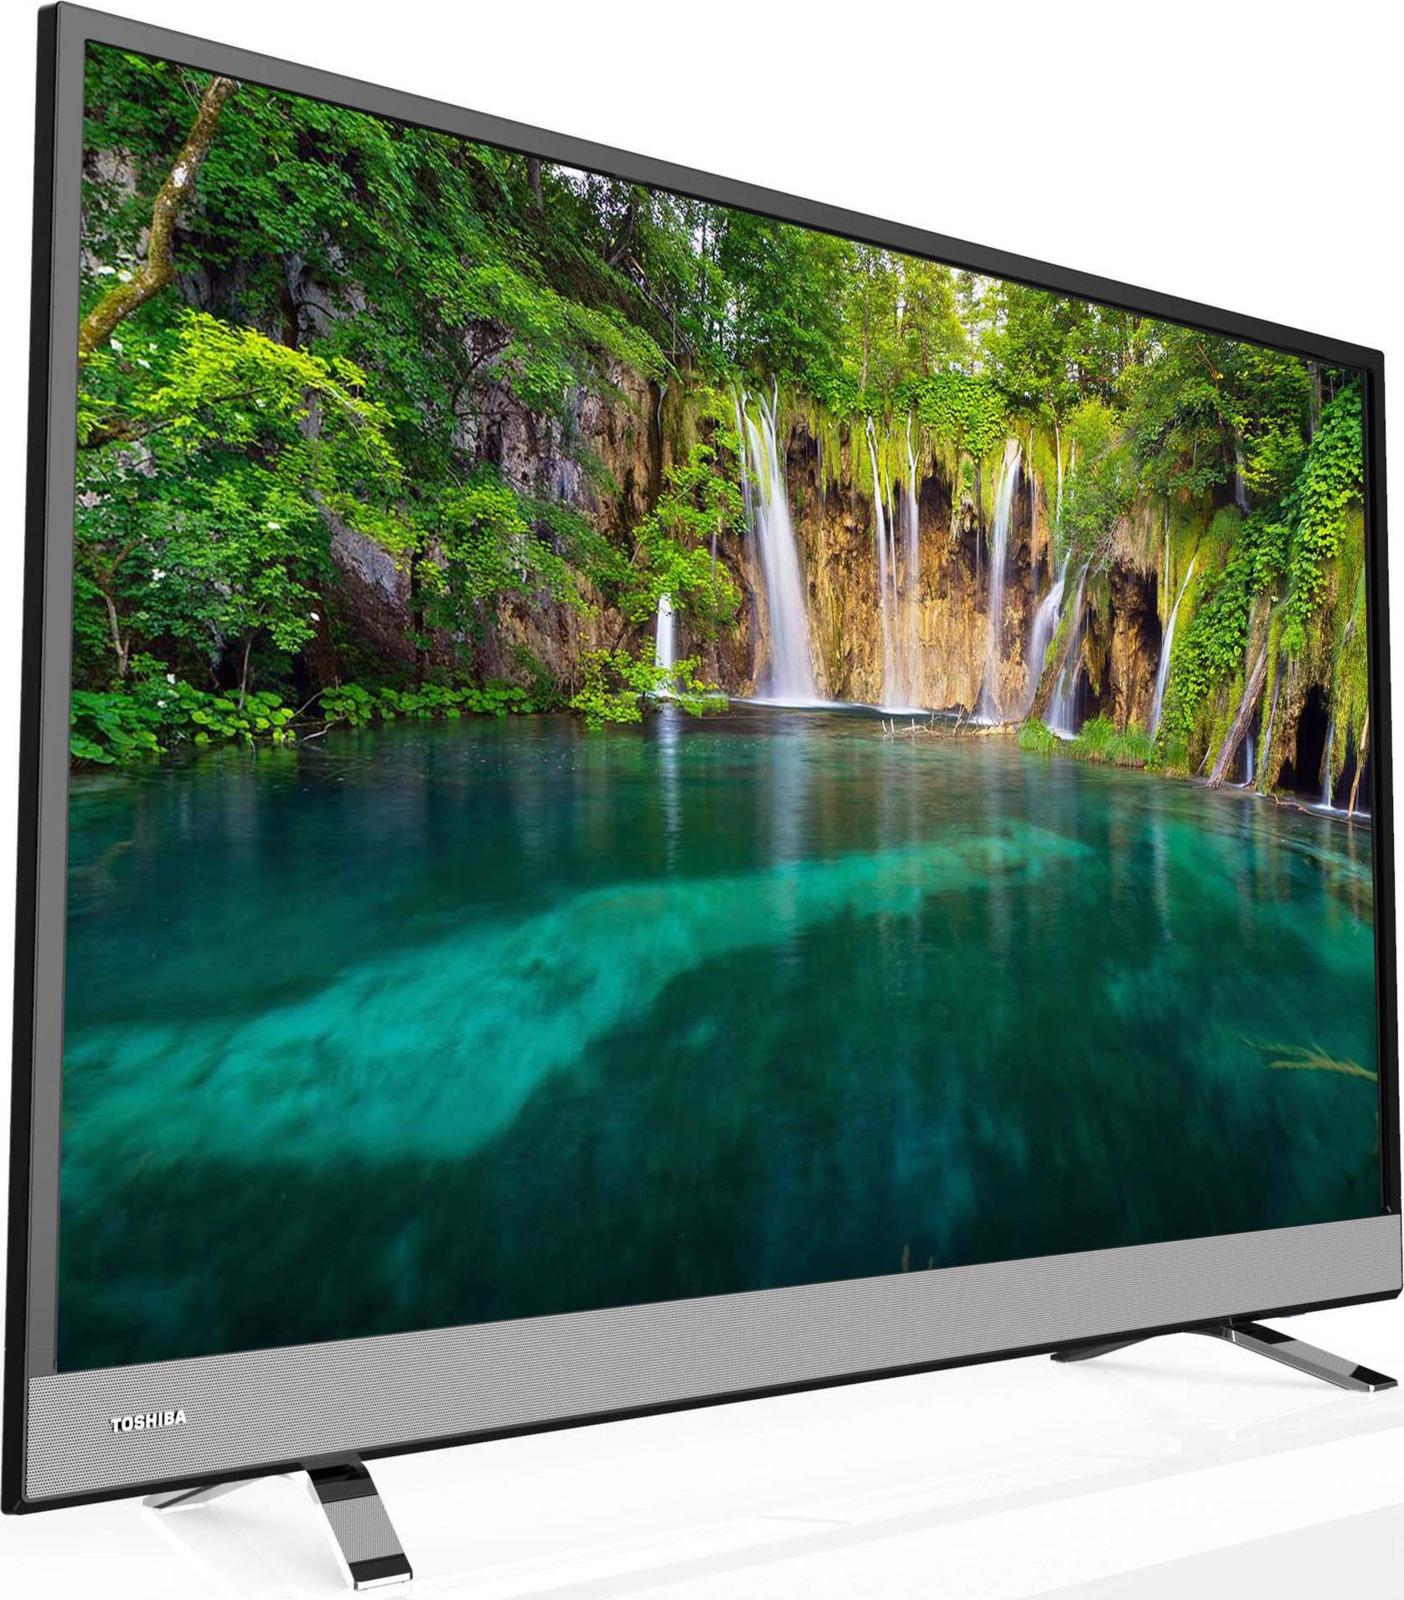 цена на Телевизор Toshiba 32L5780EC 32, черный